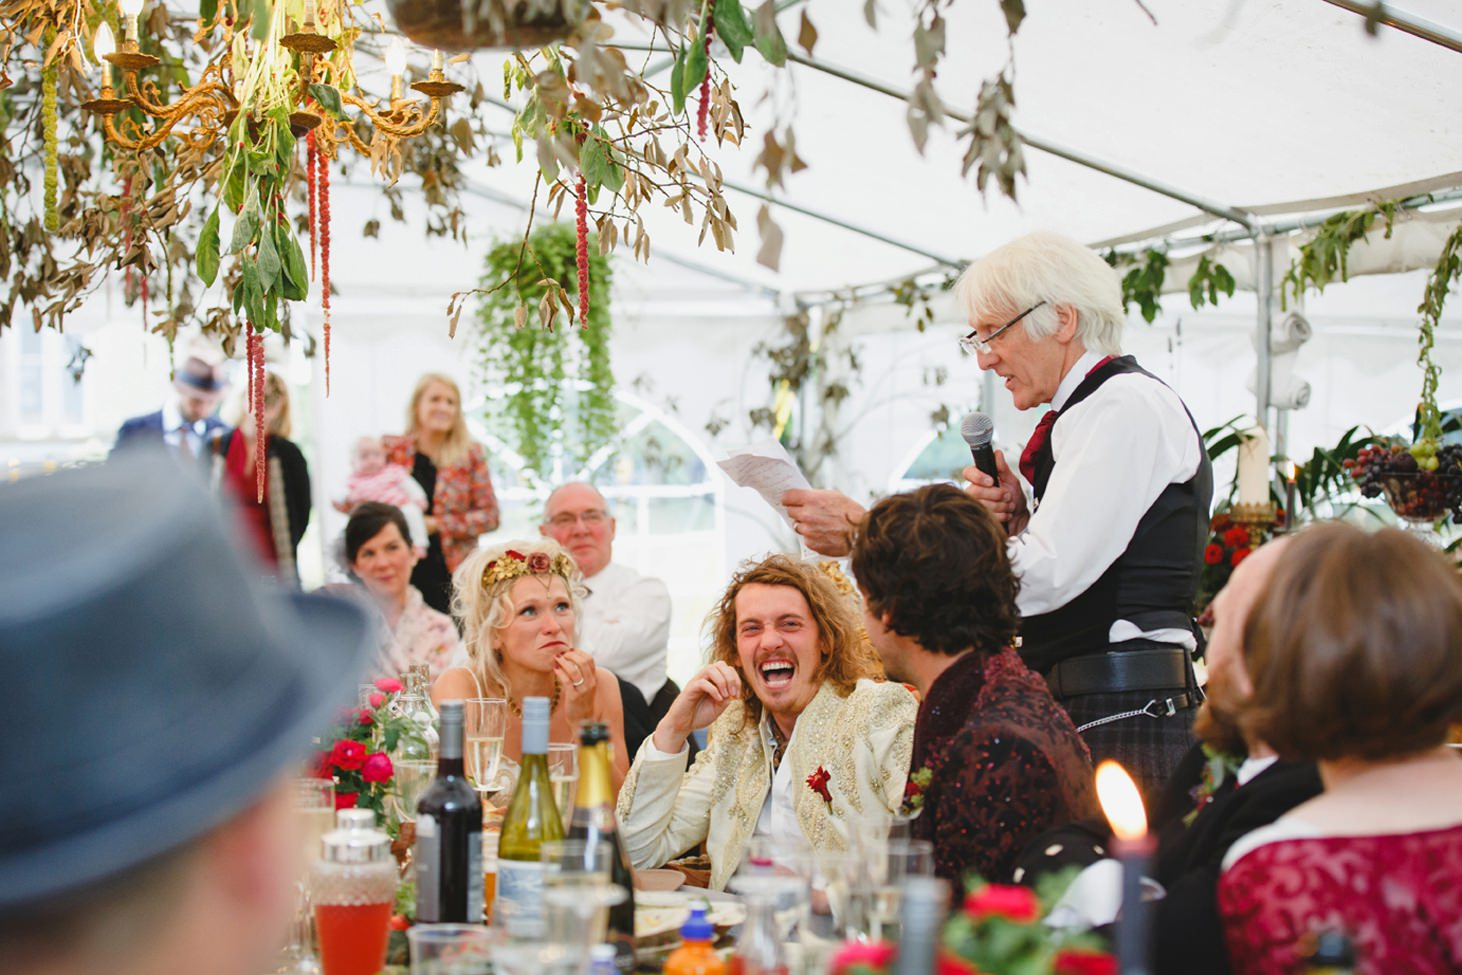 mount stuart wedding photography father of bride giving speech